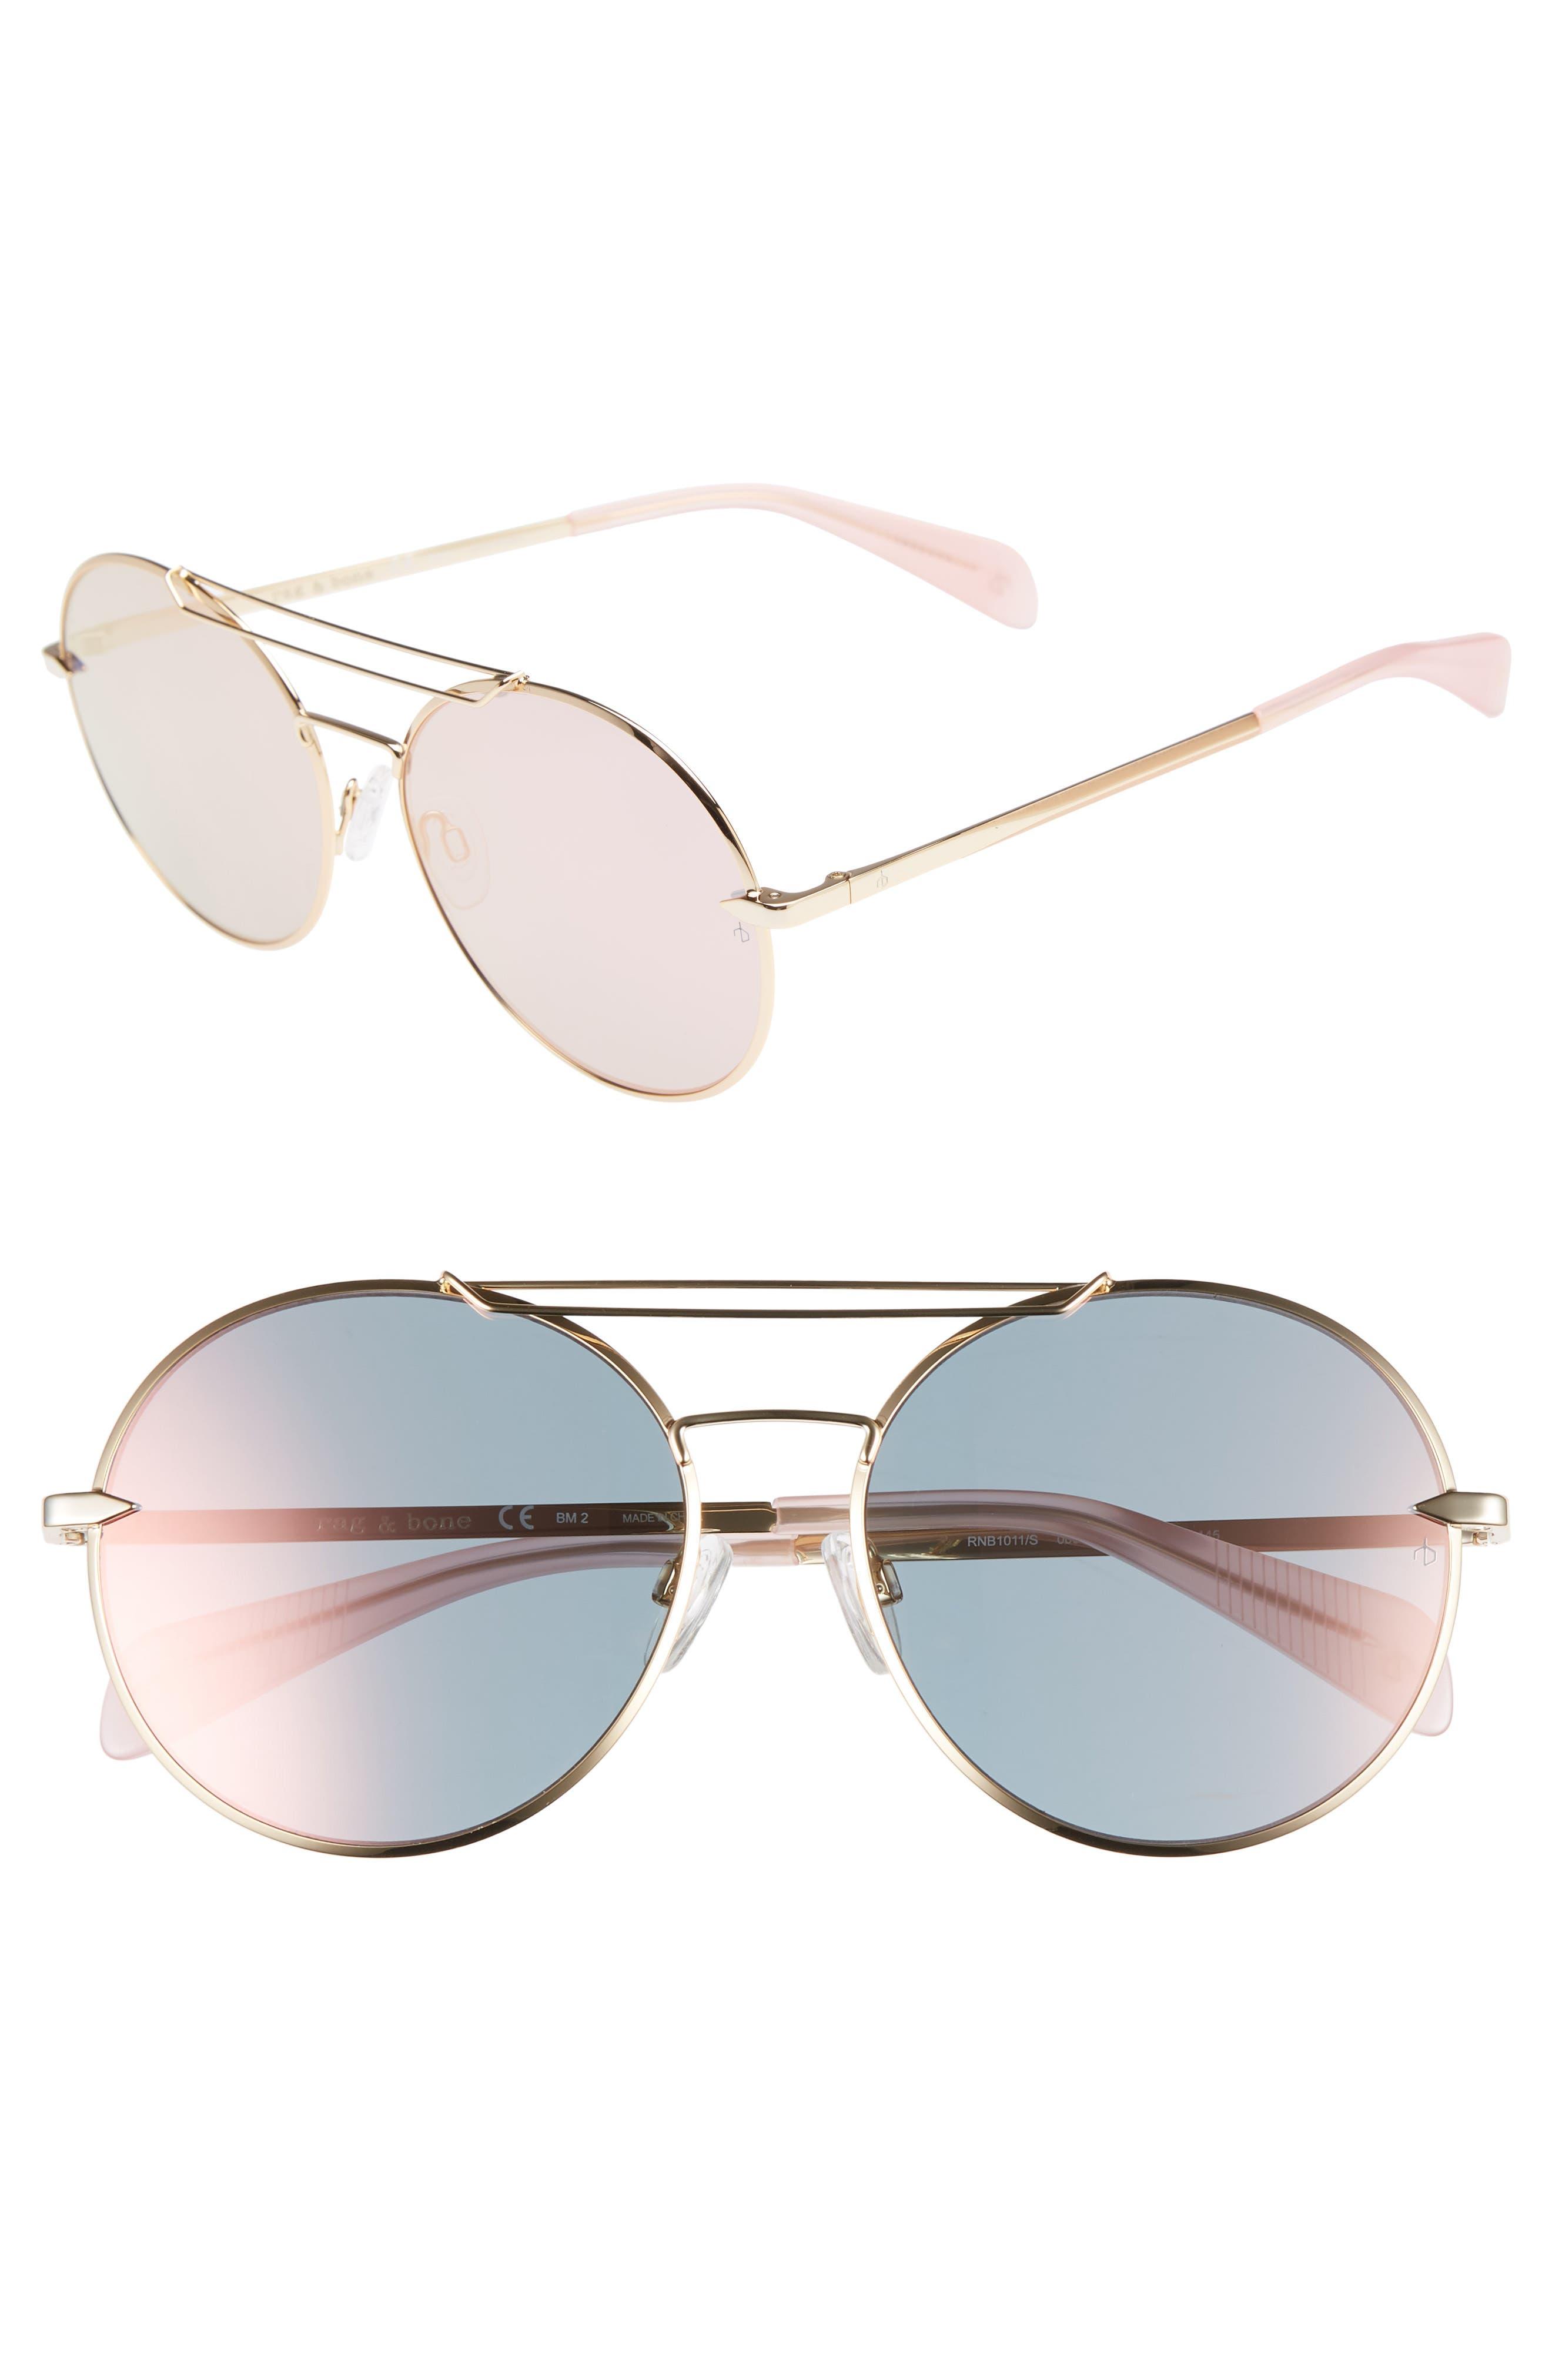 59mm Round Metal Aviator Sunglasses,                             Main thumbnail 1, color,                             ROSE GOLD